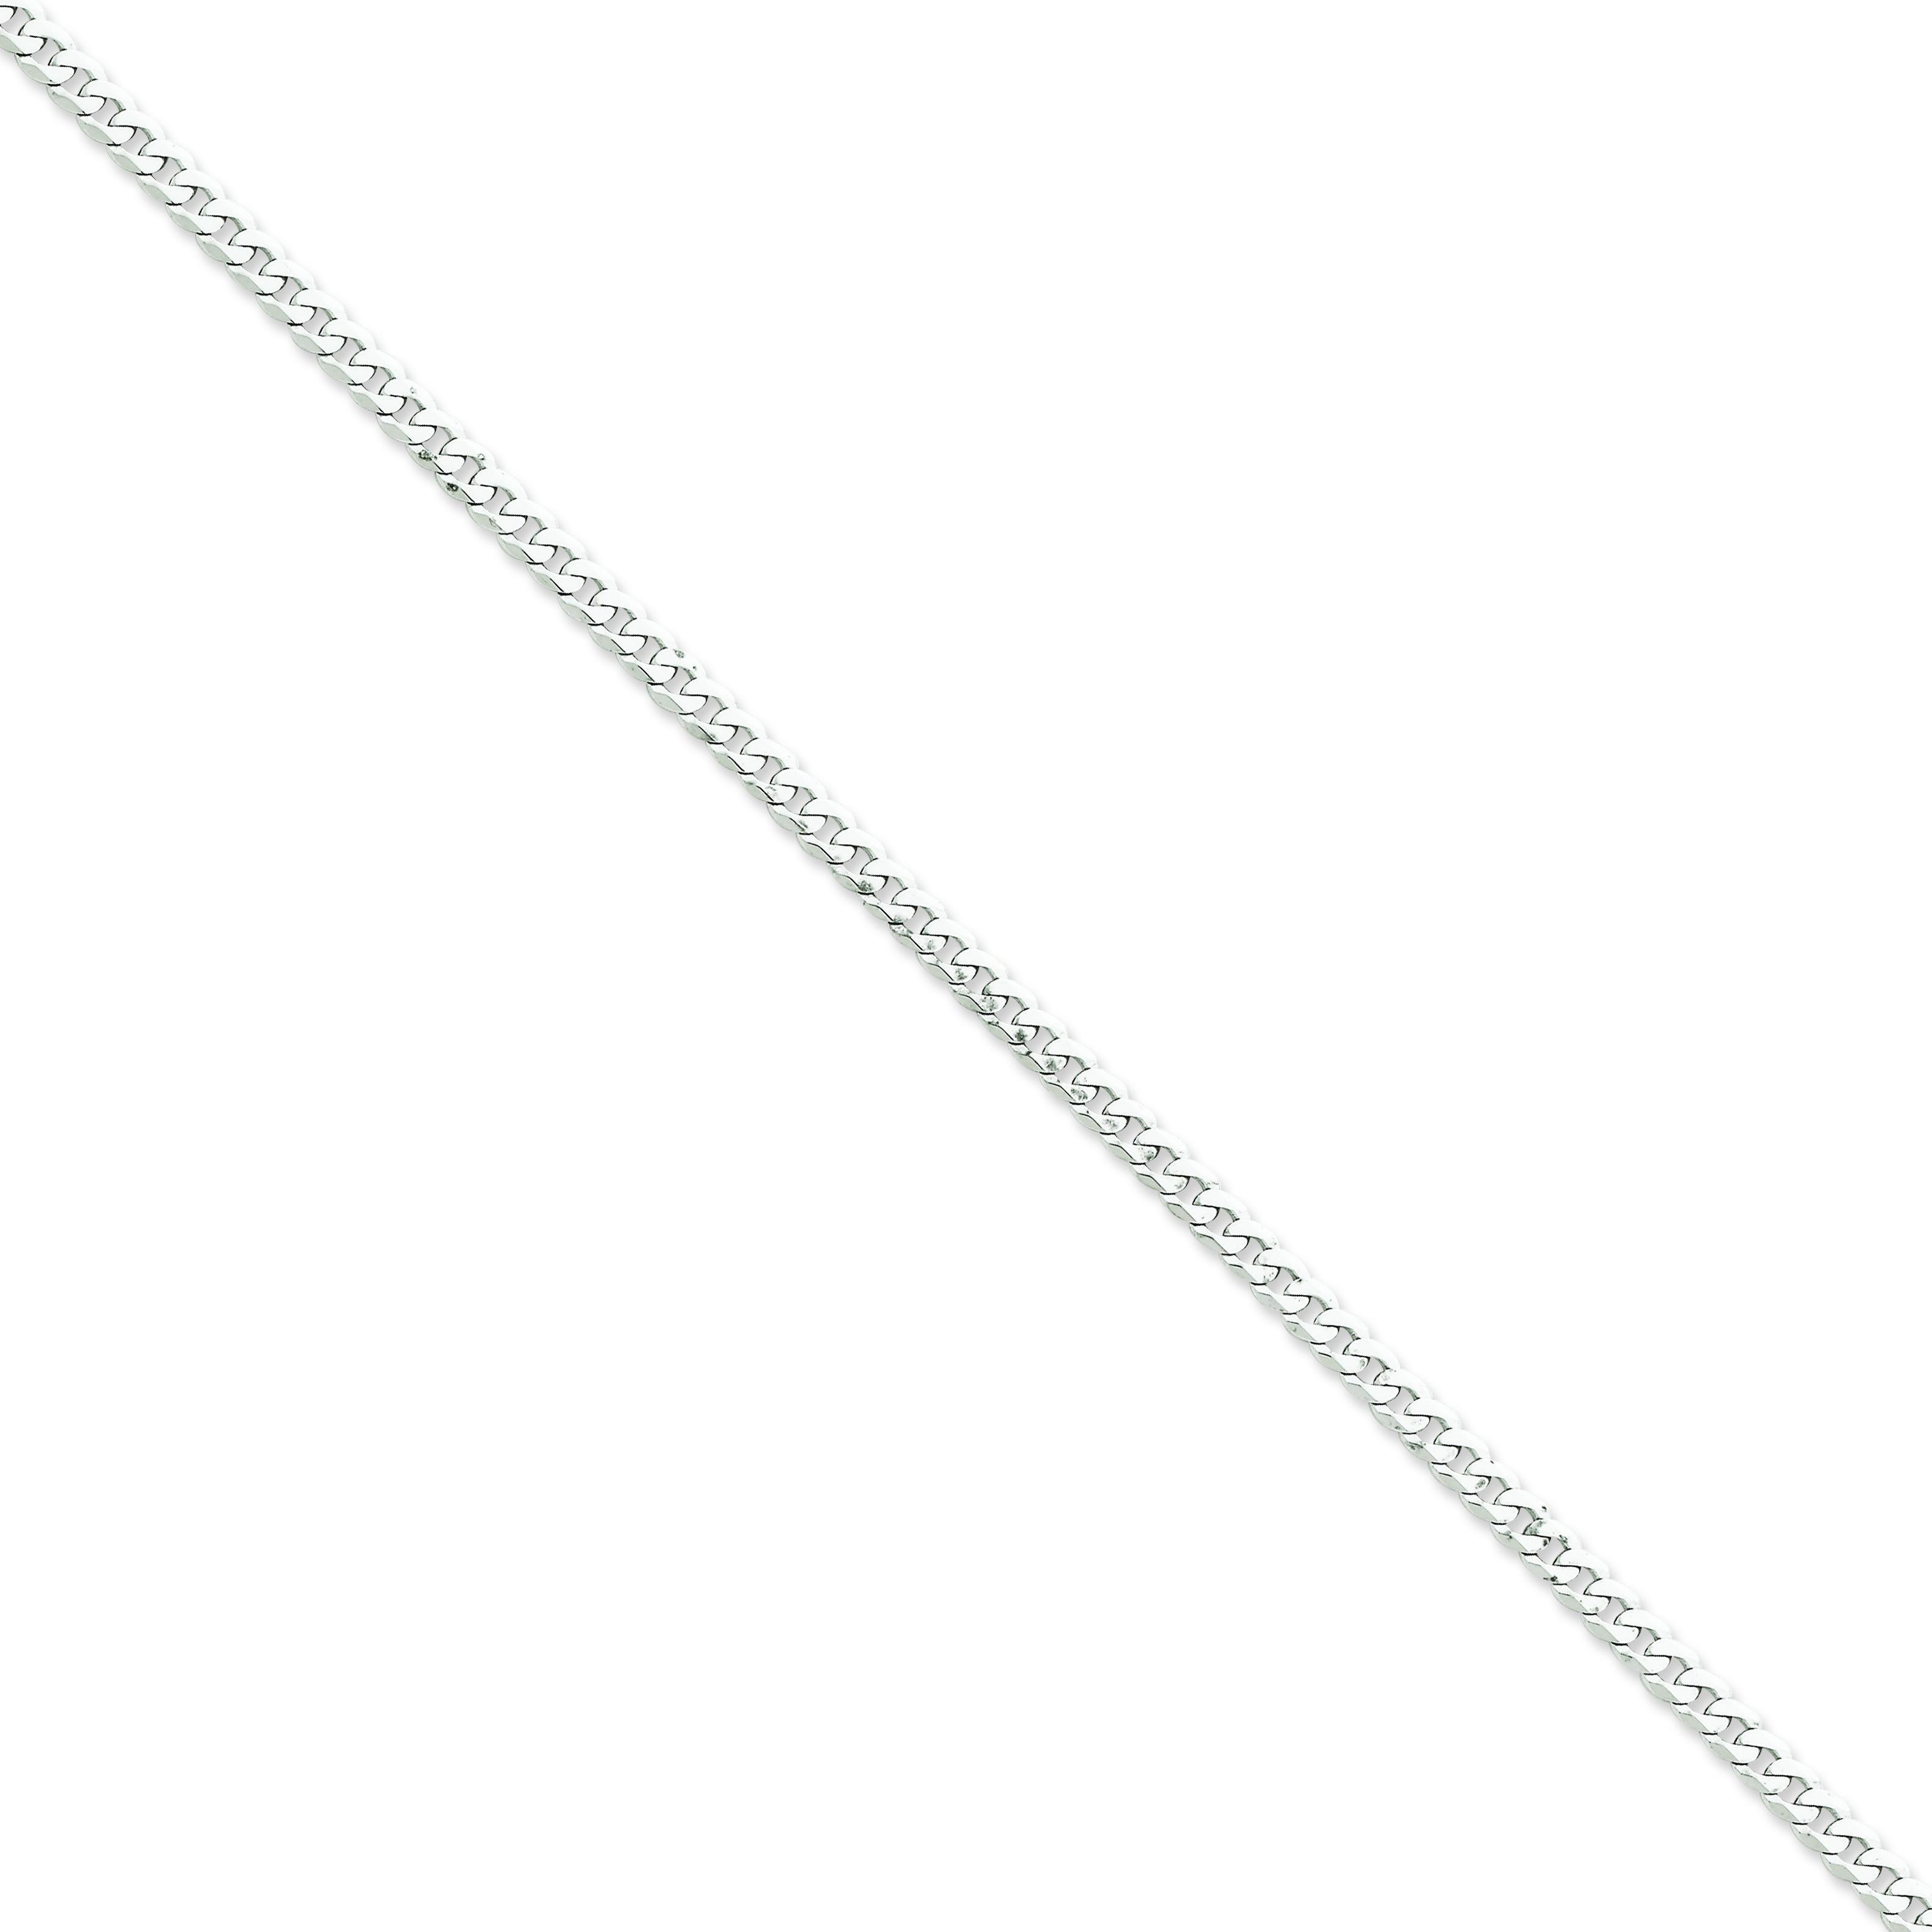 14k Yellow Gold 7 inch 3.90 mm Flat Curb Chain Bracelet